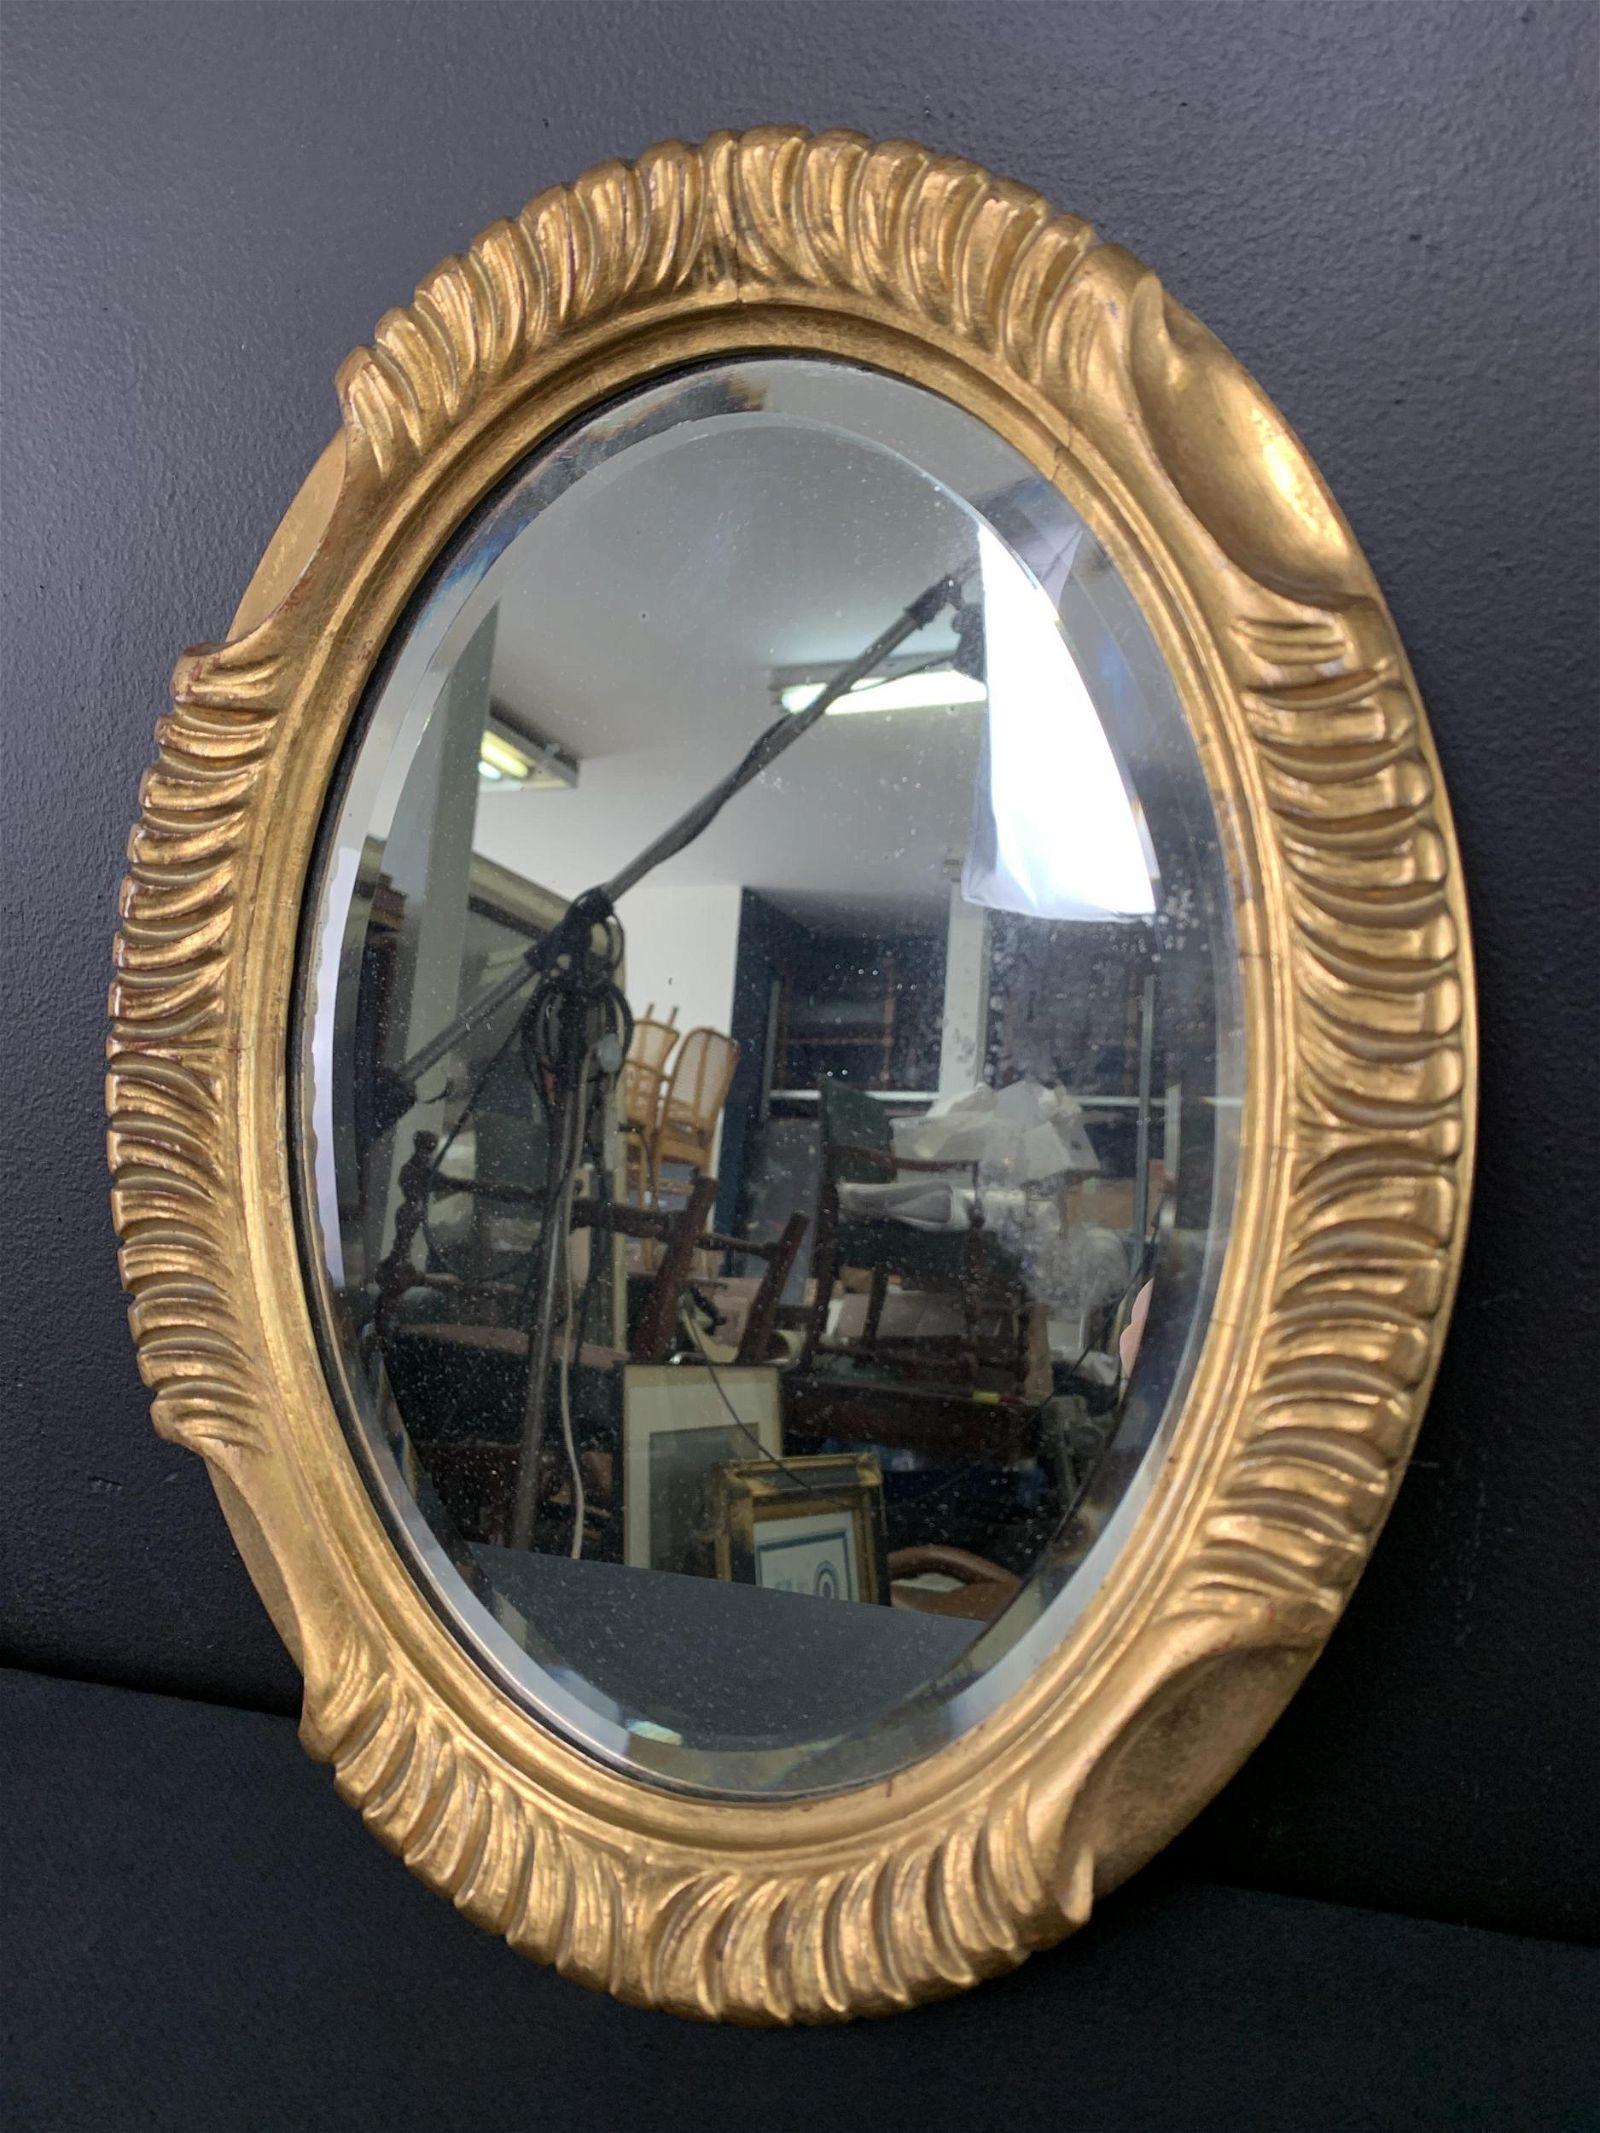 Oval Carved Gilt Wood Mirror, Beveled Edge